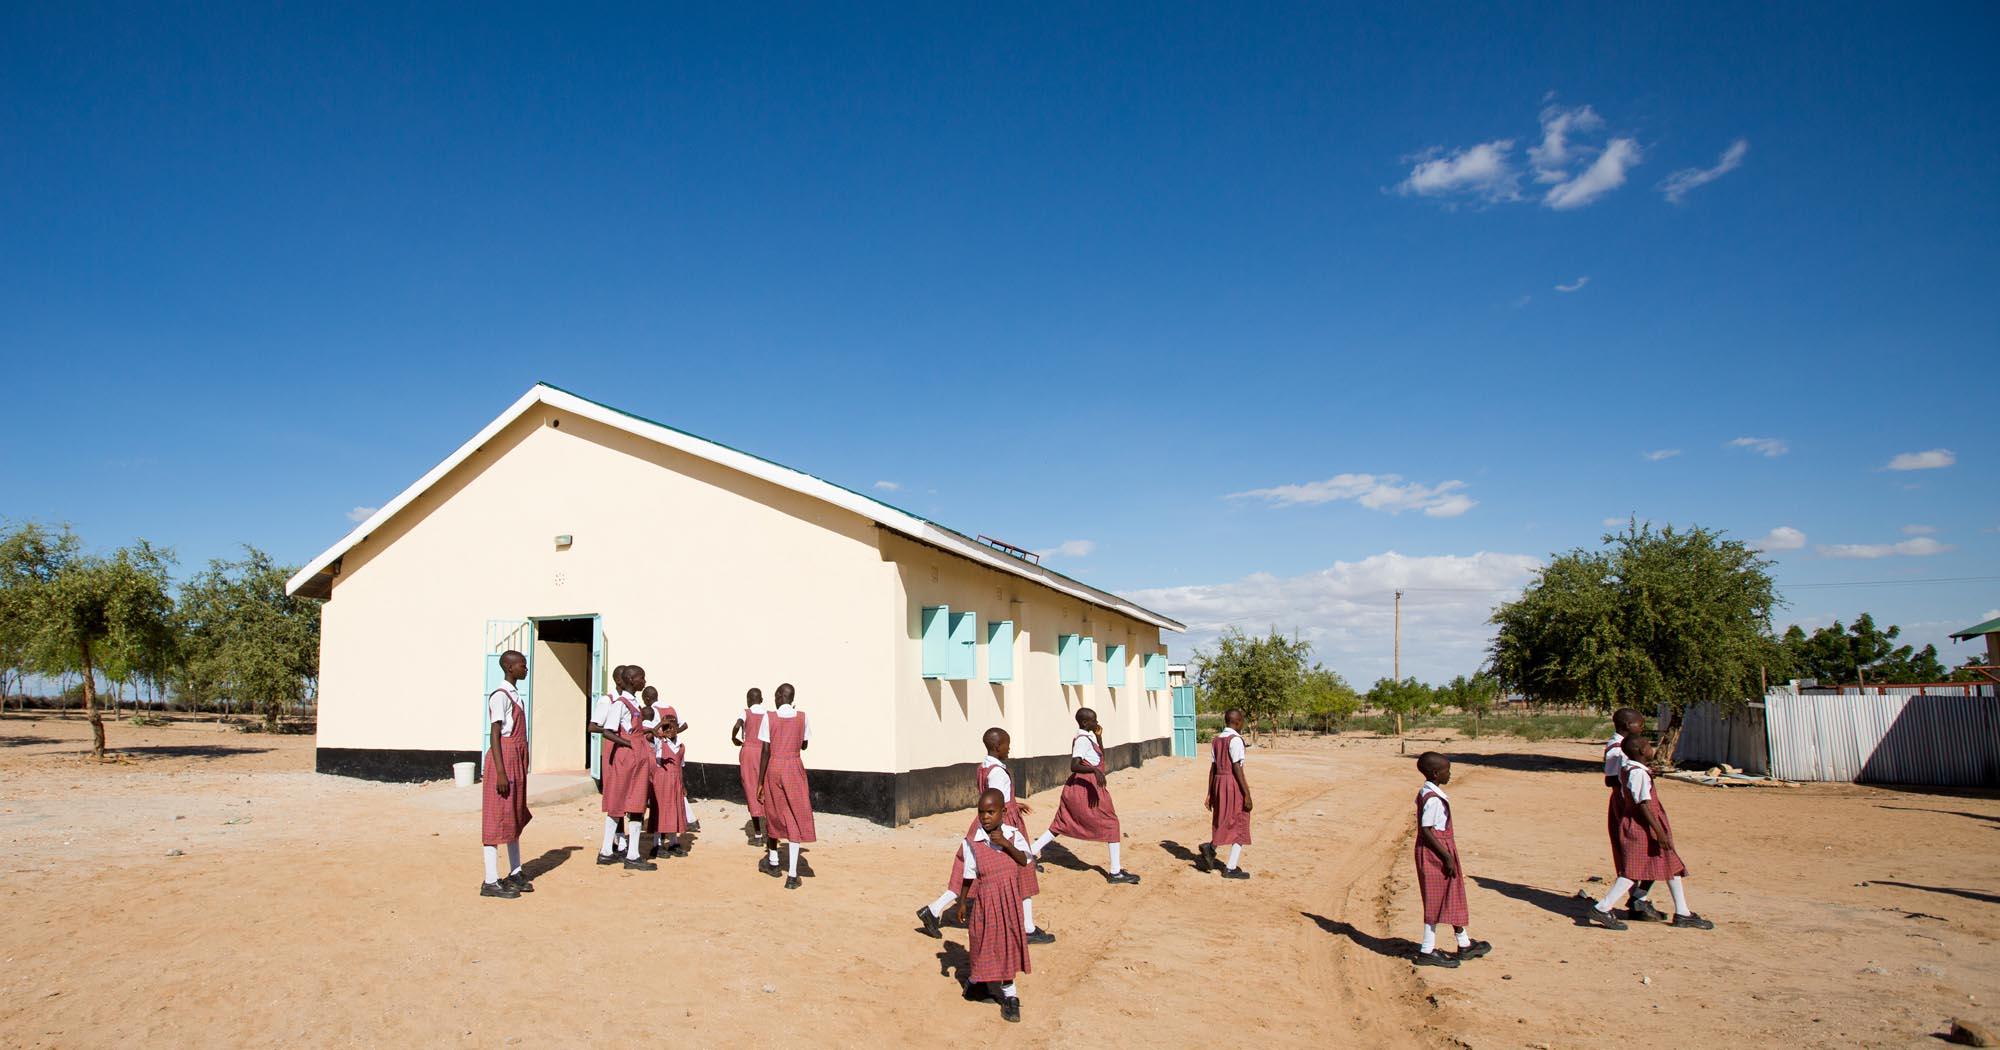 House of Hope orphanage in Kenya